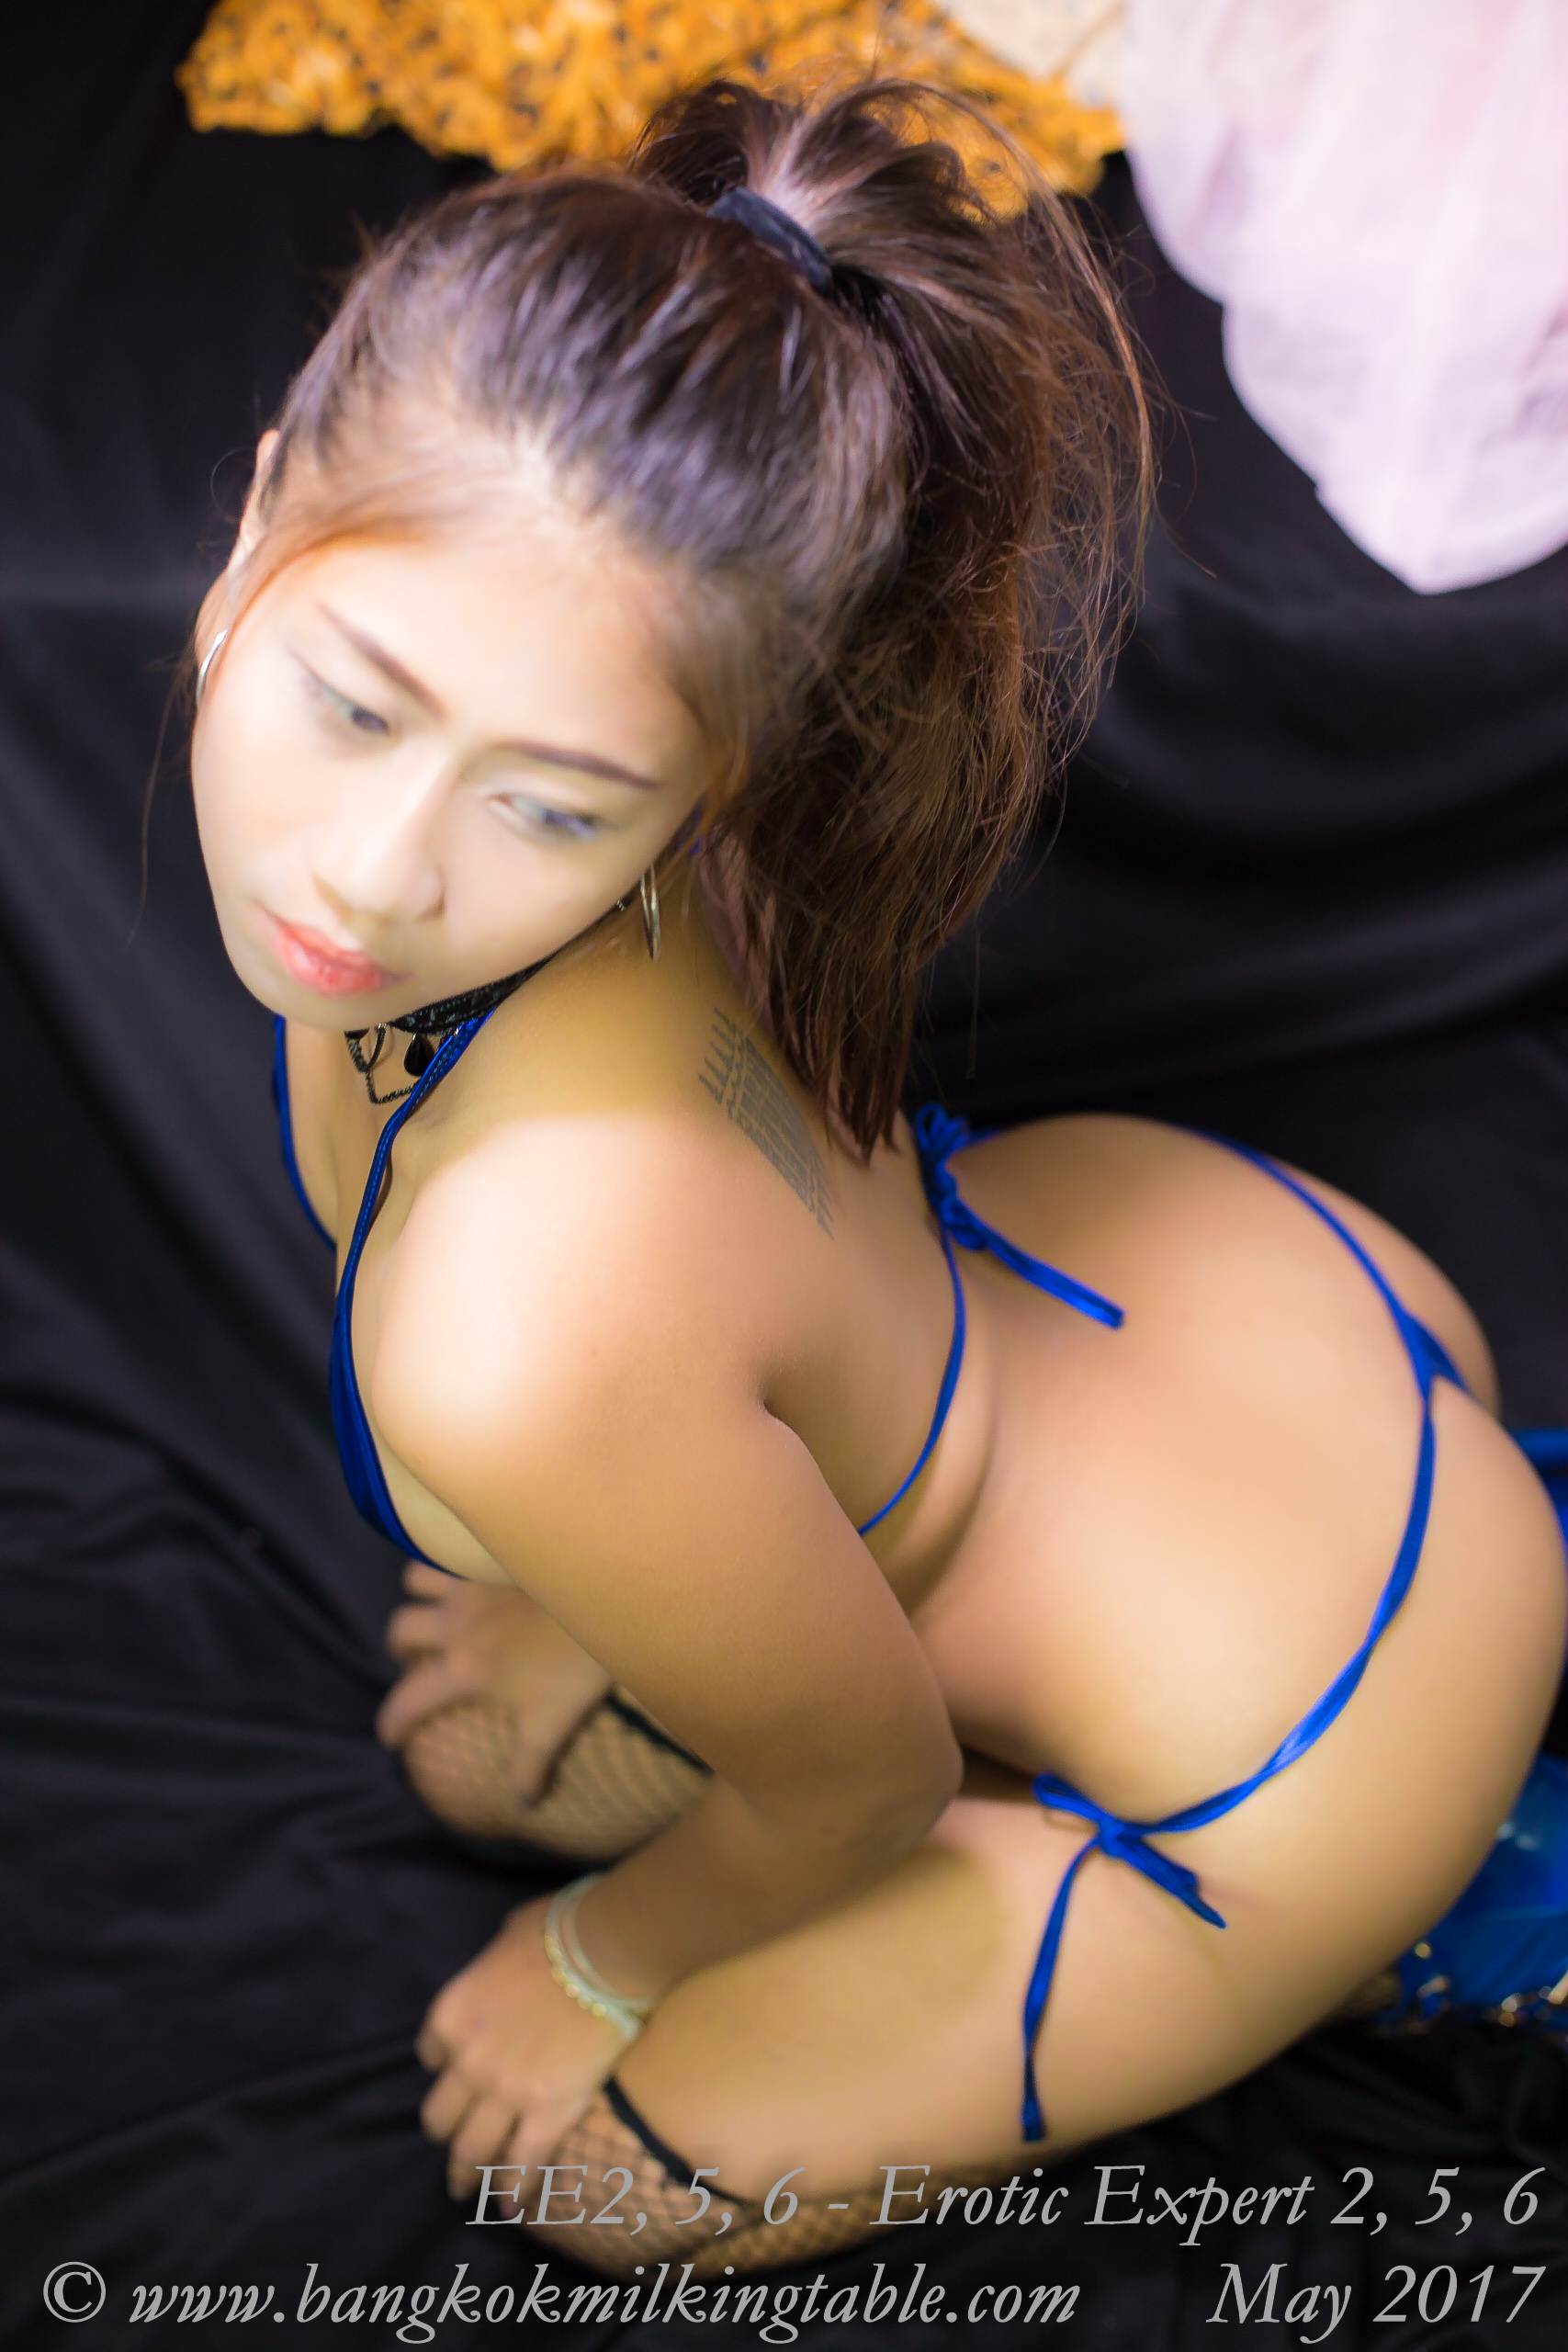 Erotic Expert 2, 5, 6 - string bikini - Bangkok Escort Massage Milking 0517-81